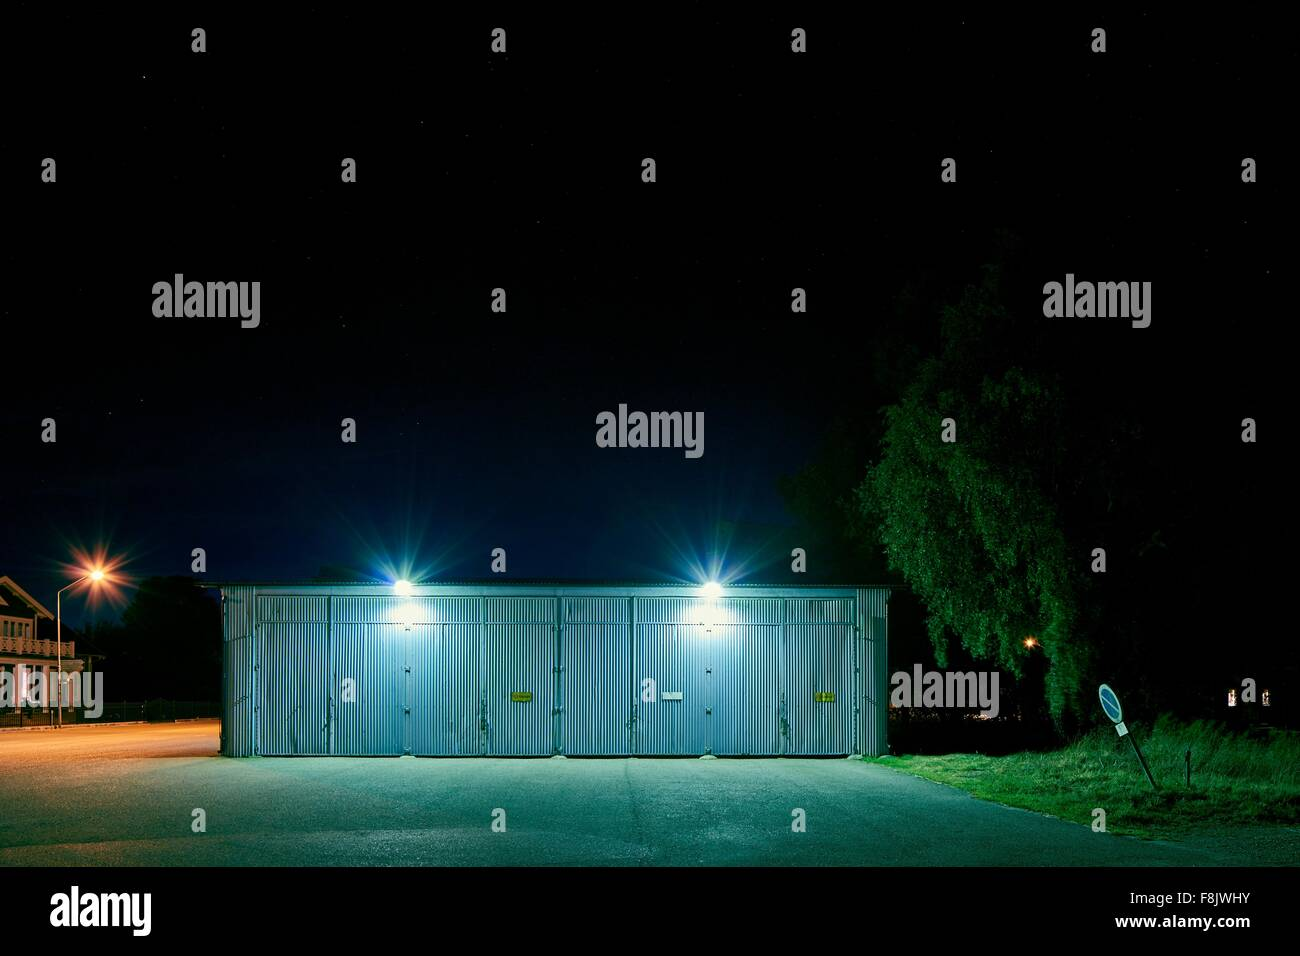 Garage with spotlights at night, Kalmar, Sweden - Stock Image